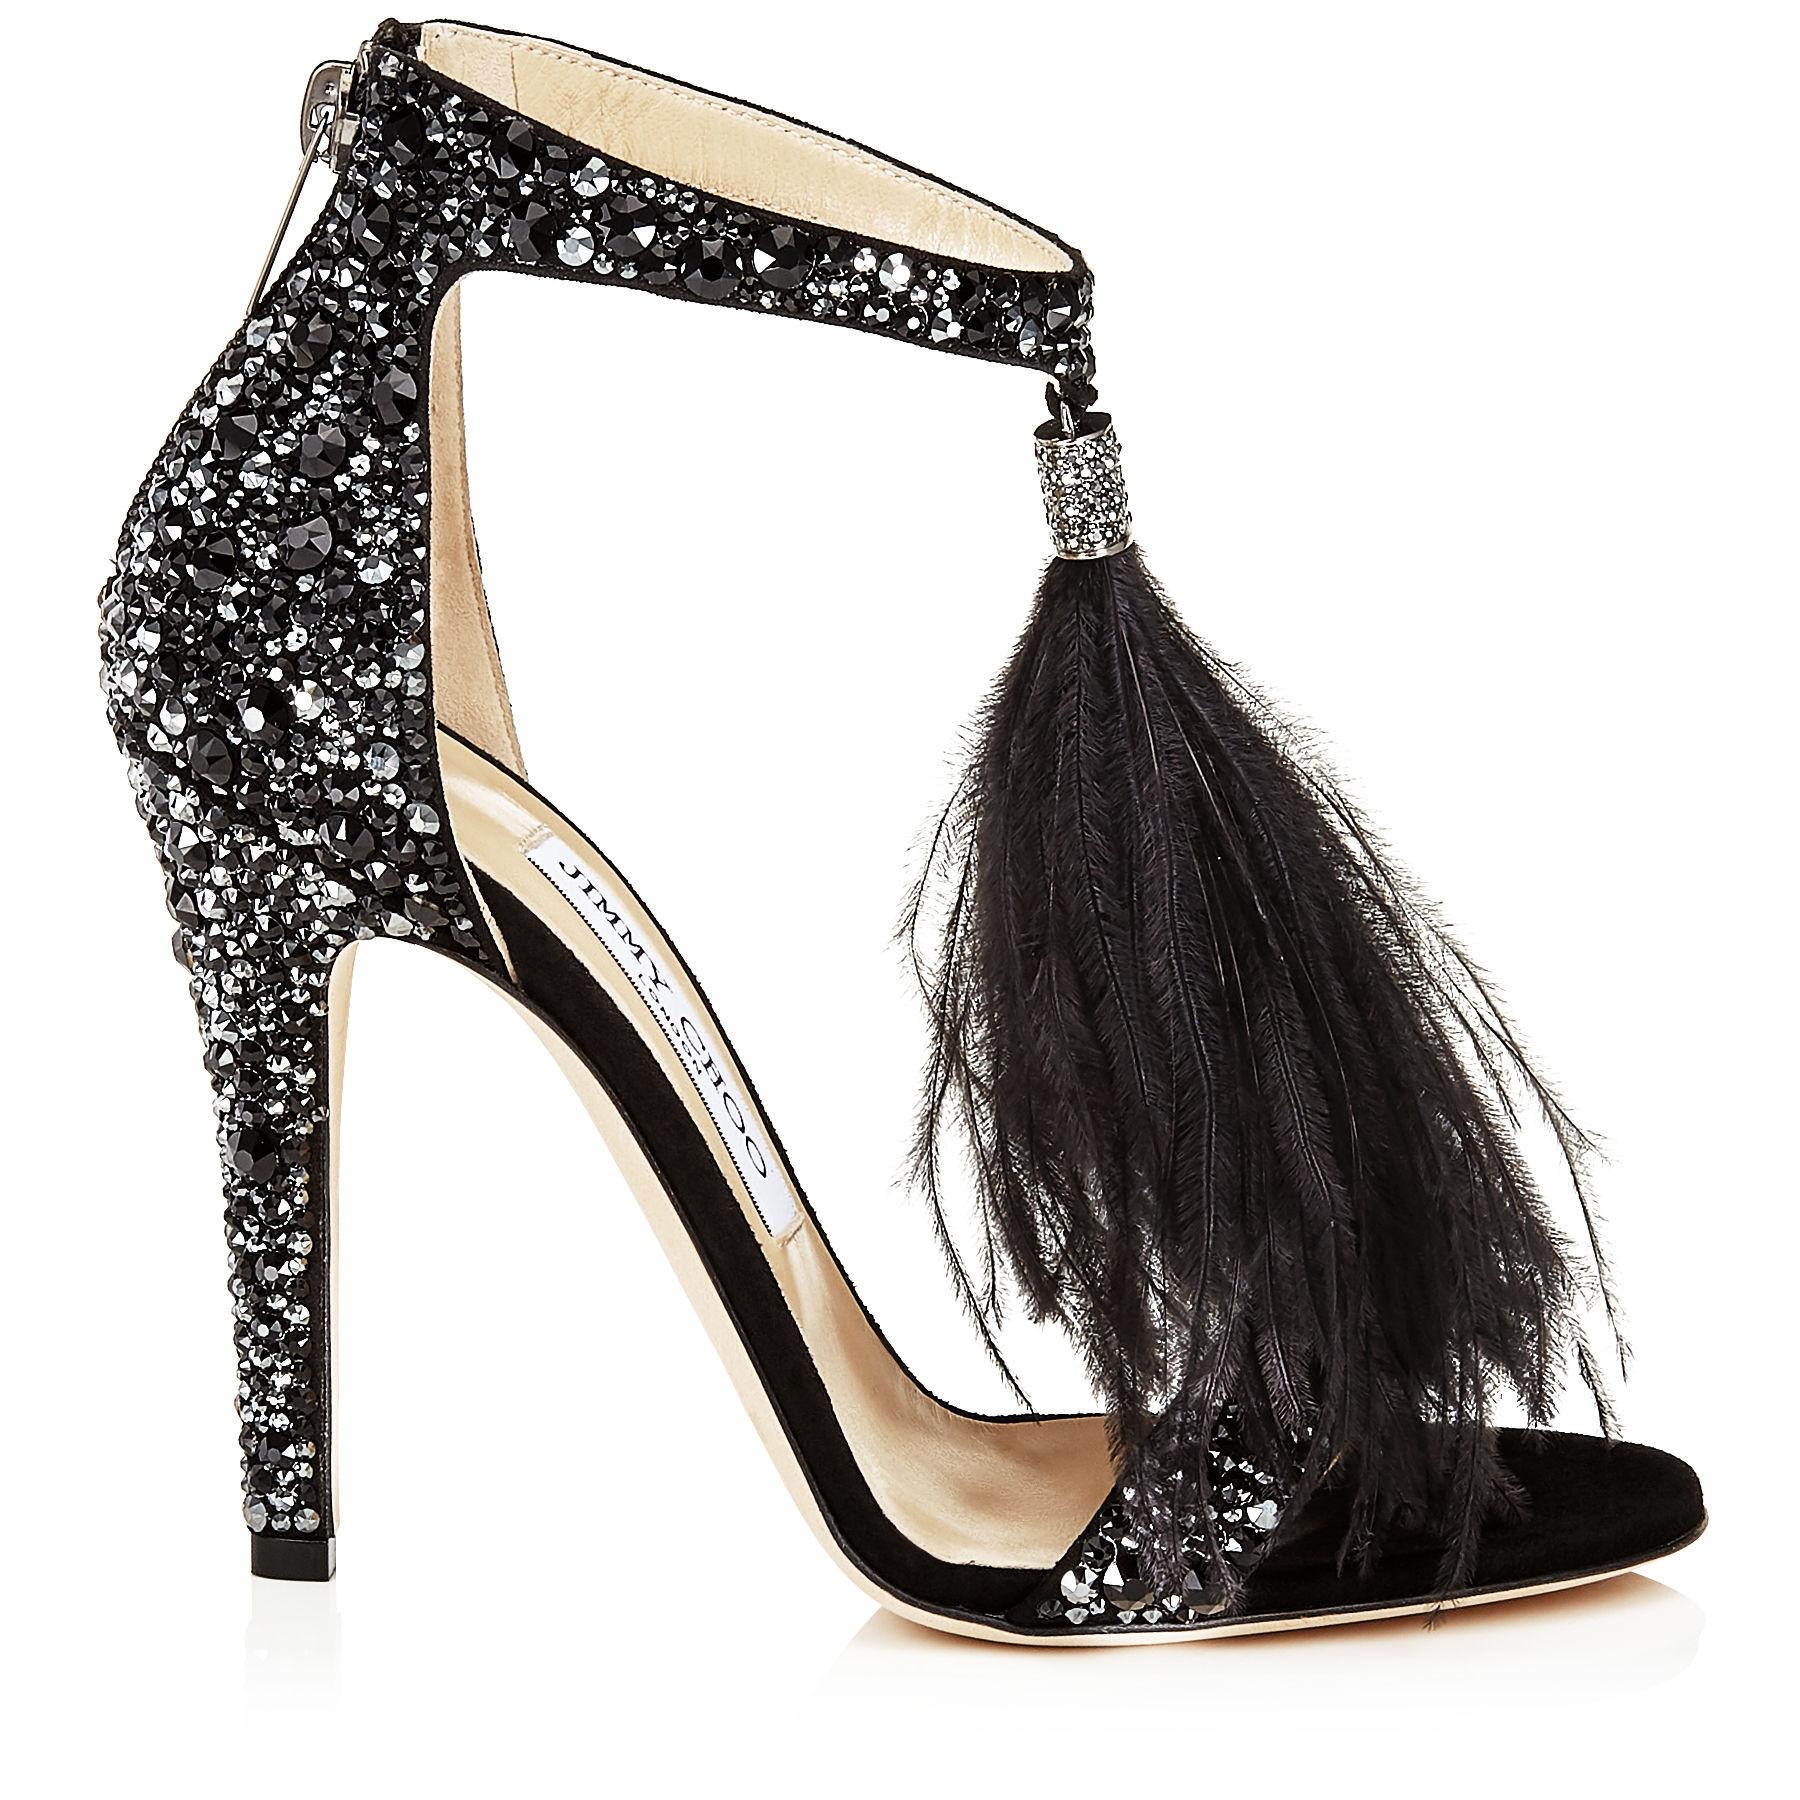 Sandalias y zapatos de Jimmy Choo